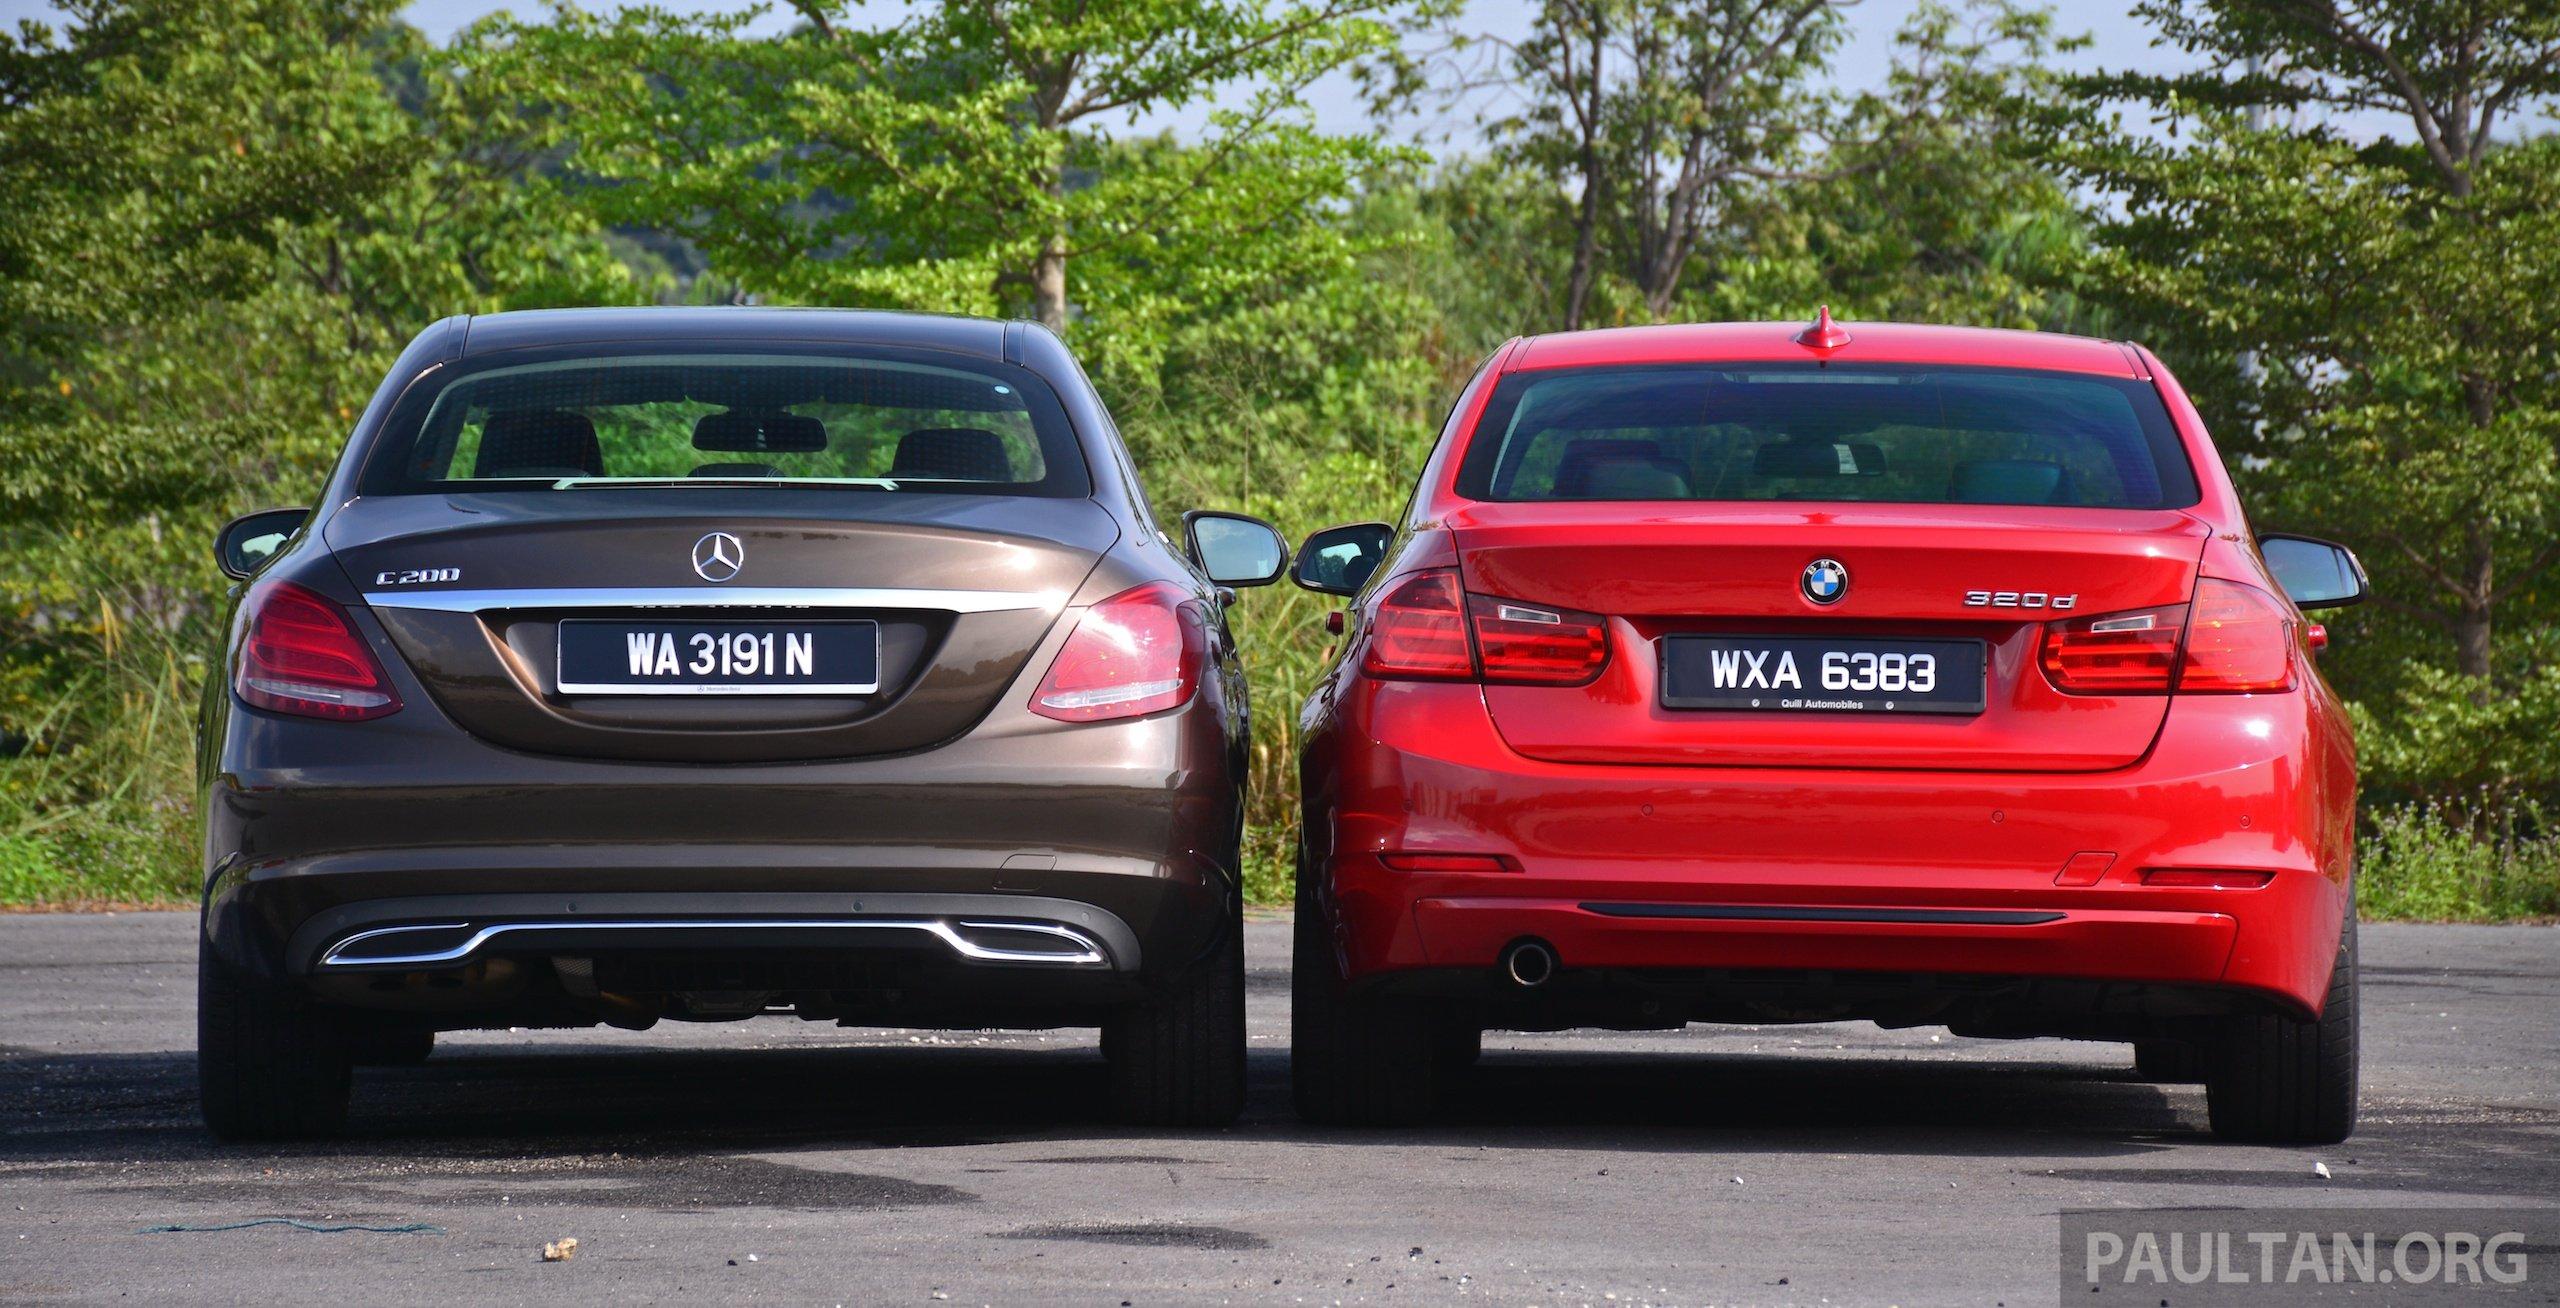 Gallery w205 merc c class vs f30 bmw 3 series image 286255 for Mercedes benz cla vs c class